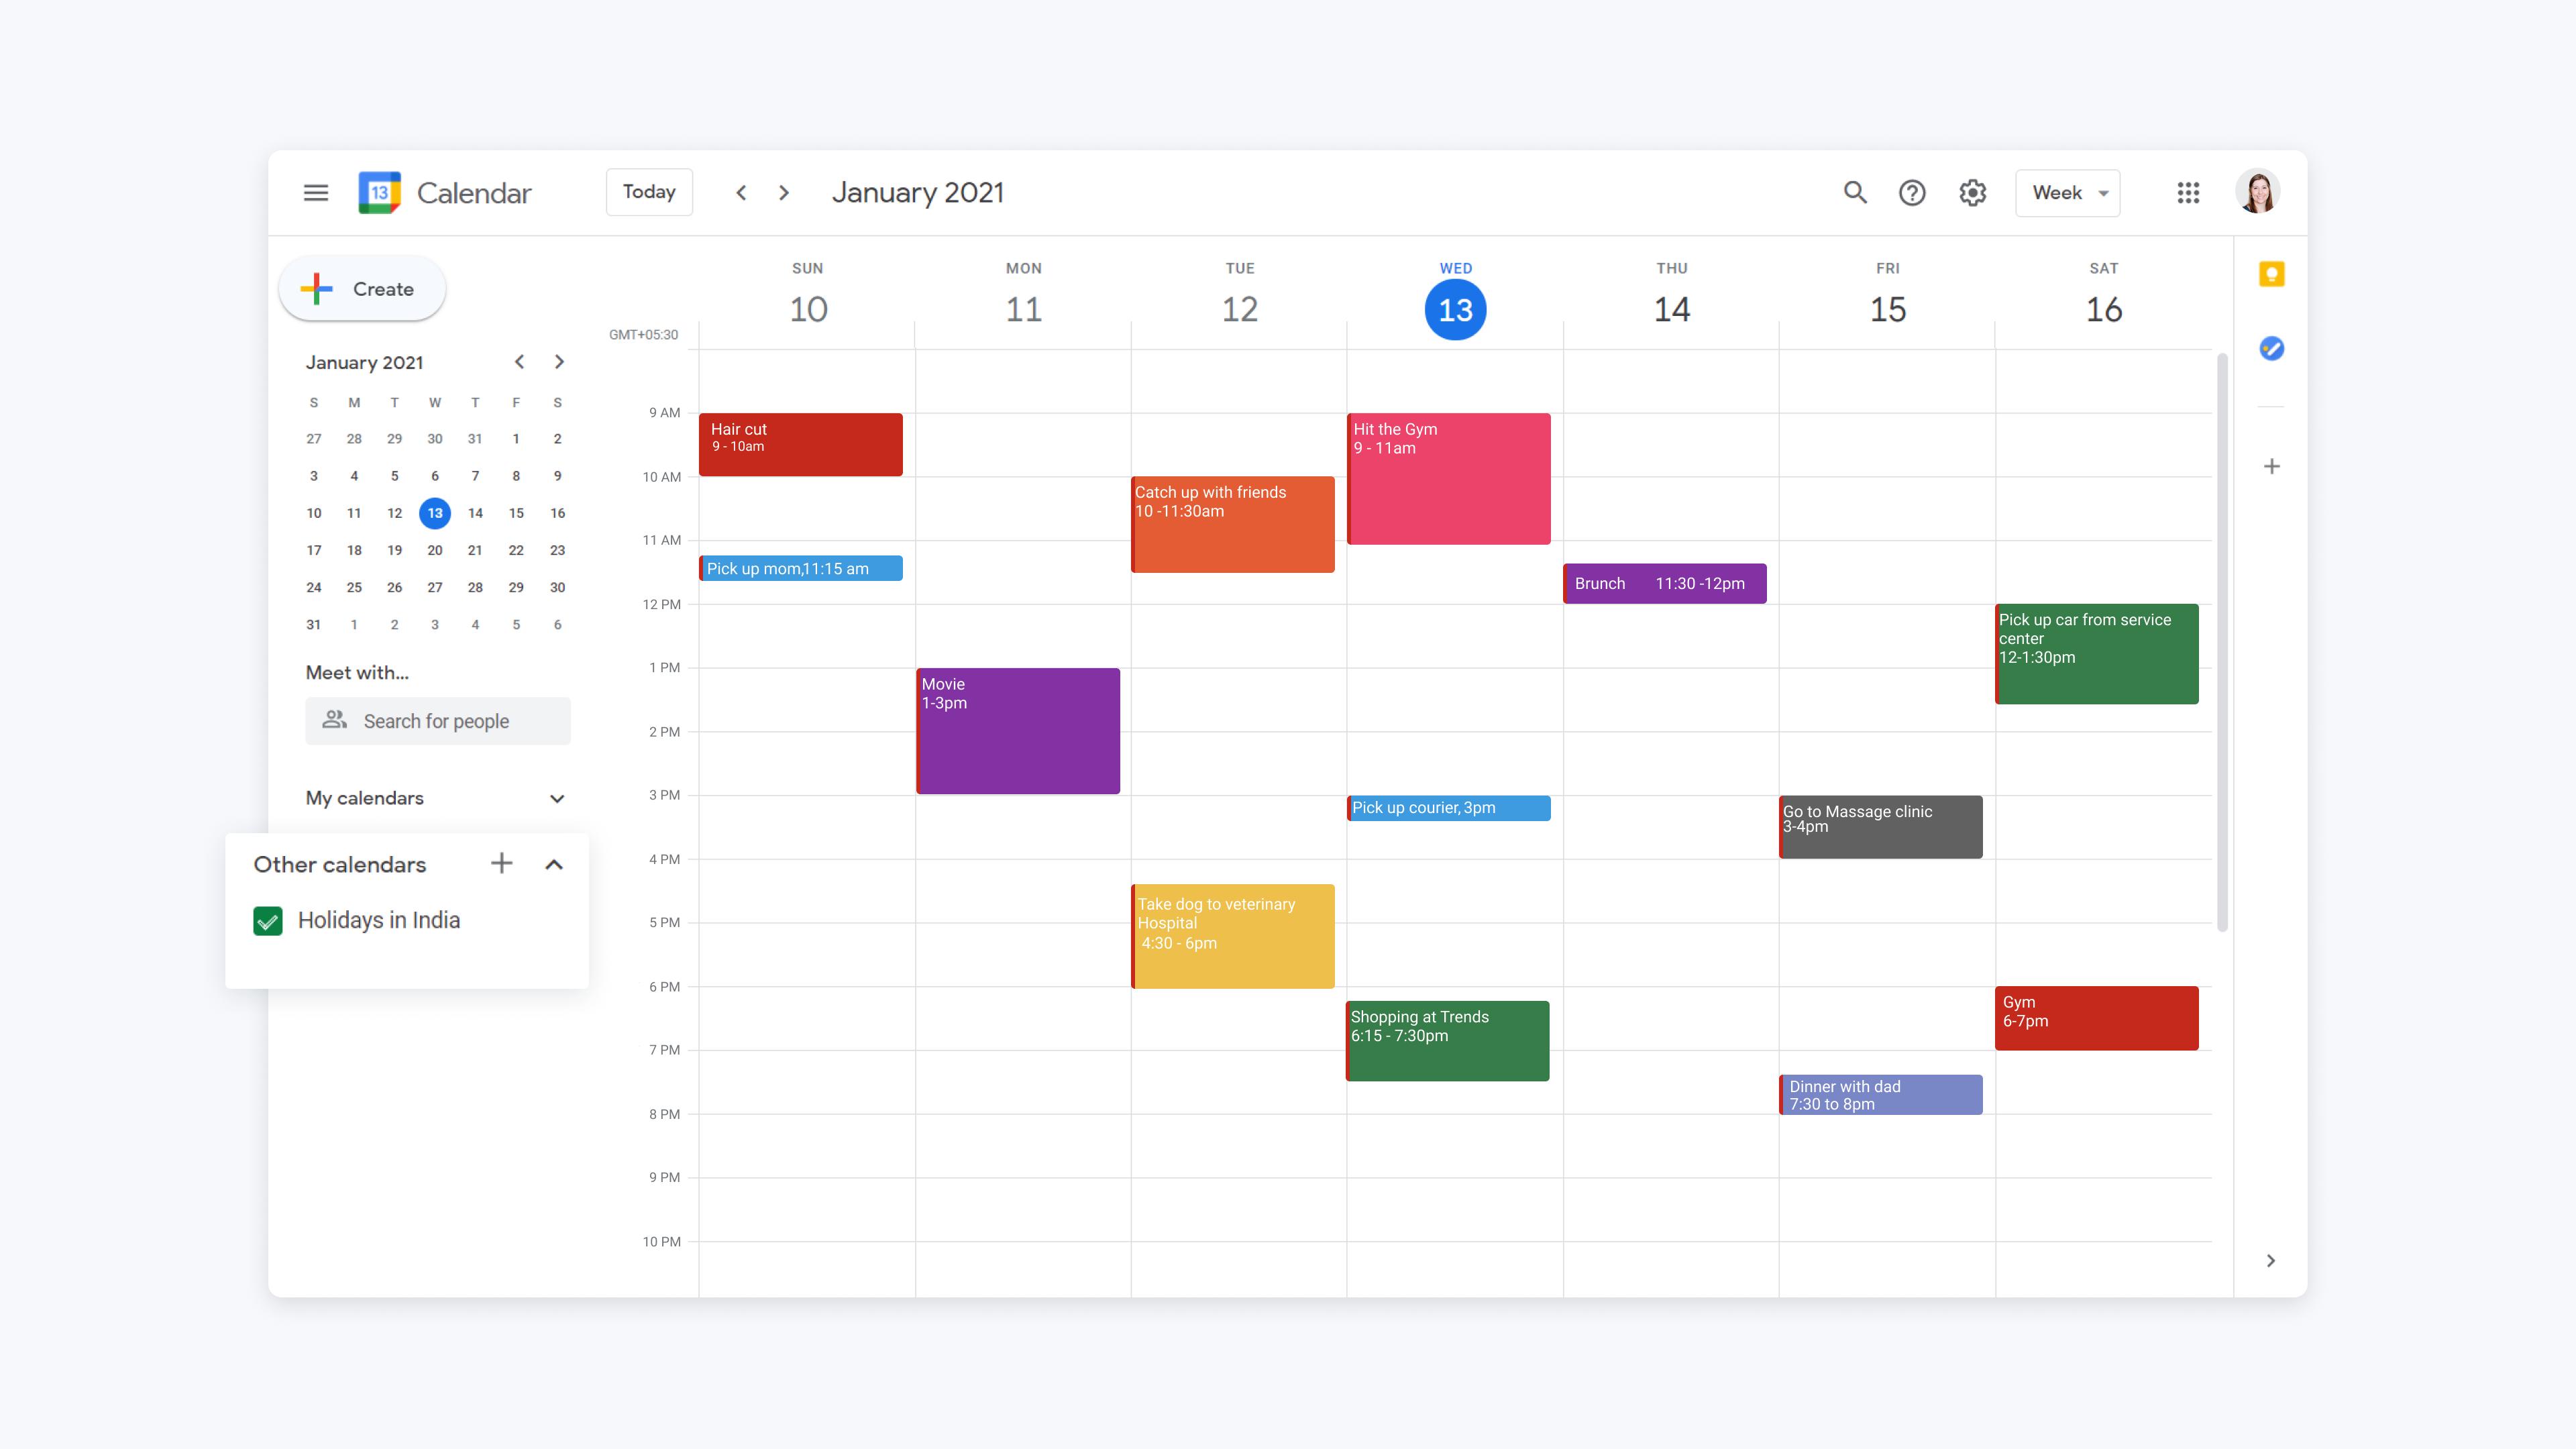 google calendar via web showing add other calendar option